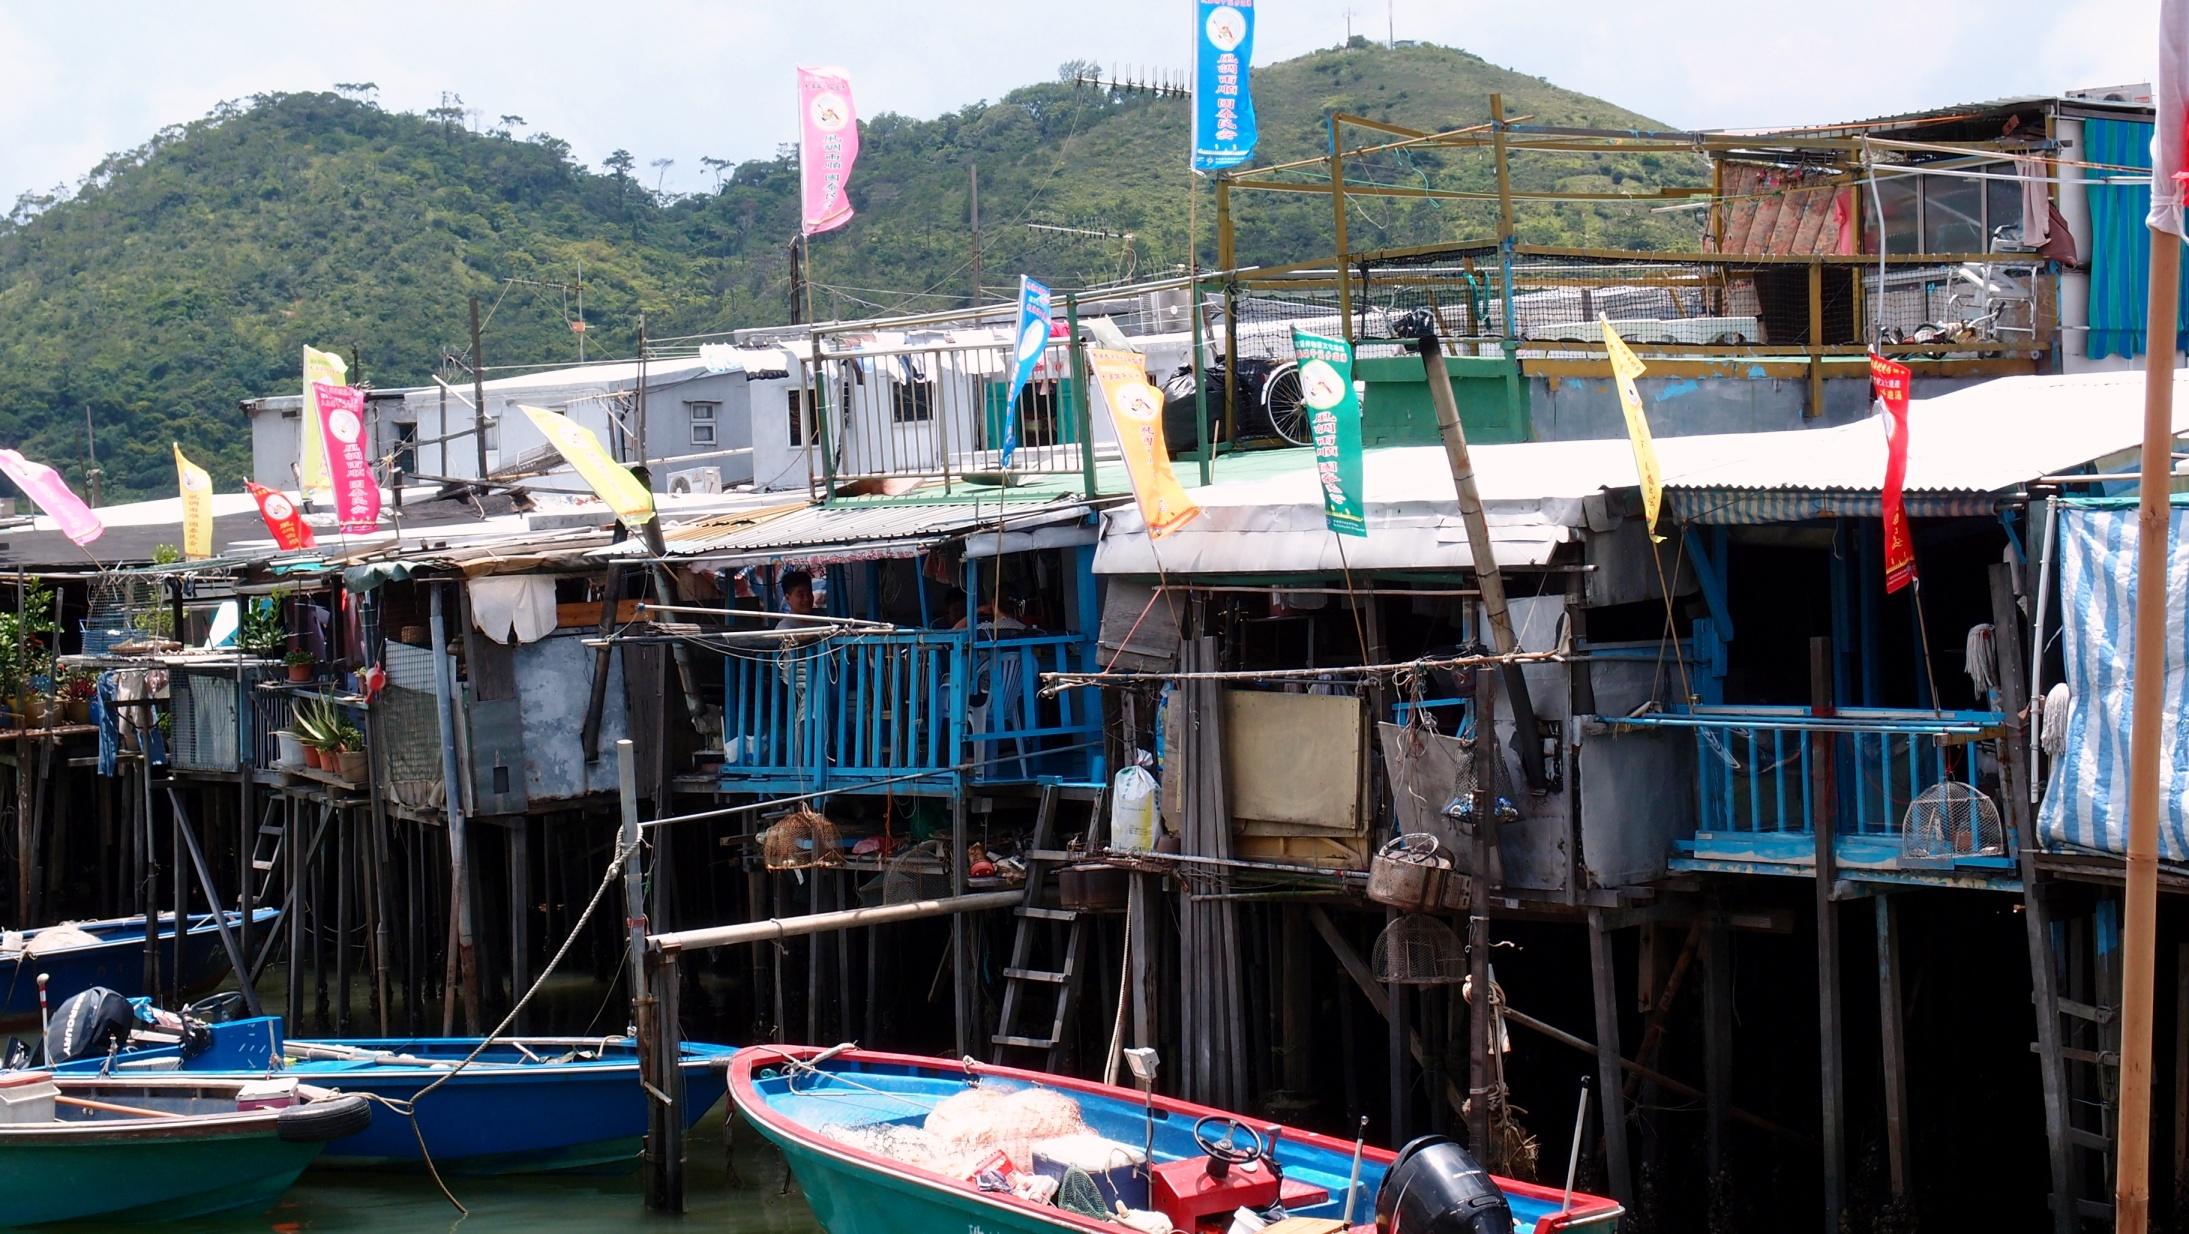 Not the most luxurious housing in Hong Kong